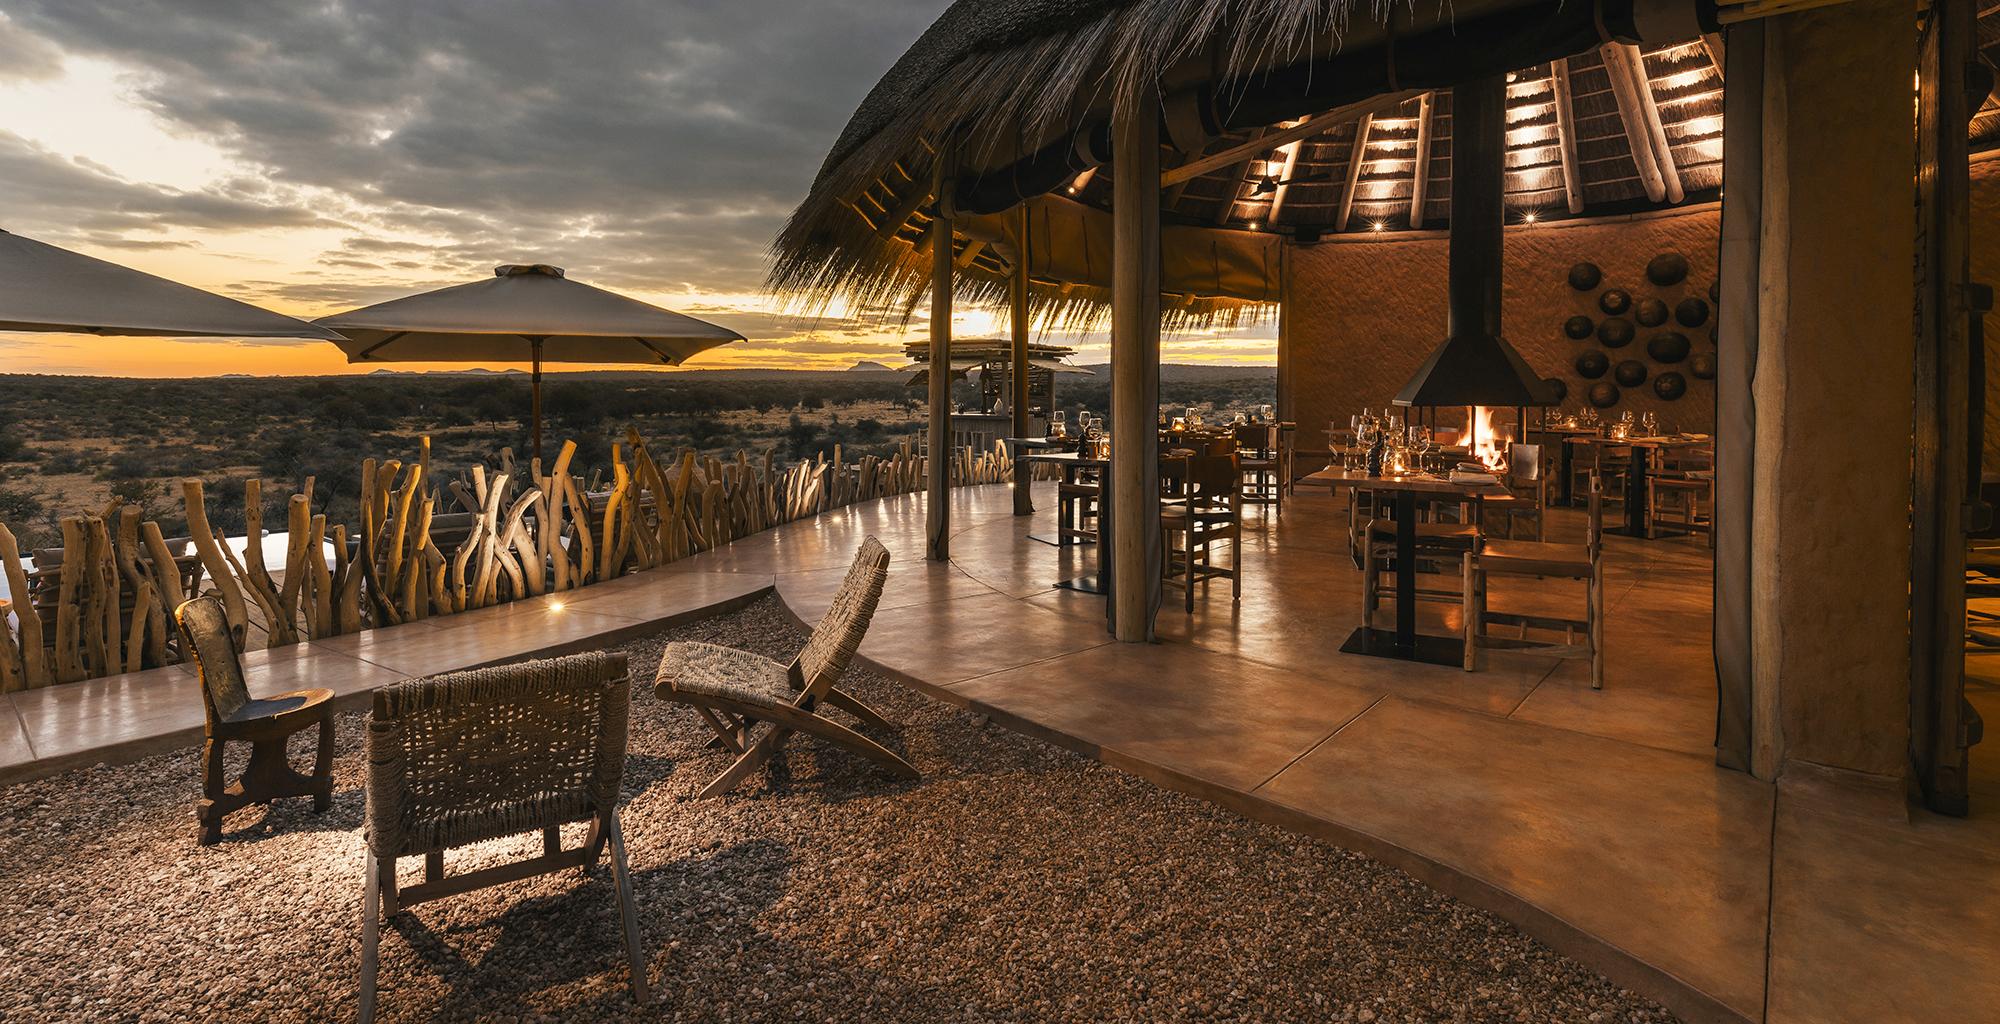 Namibia-Omaanda-Restaurant